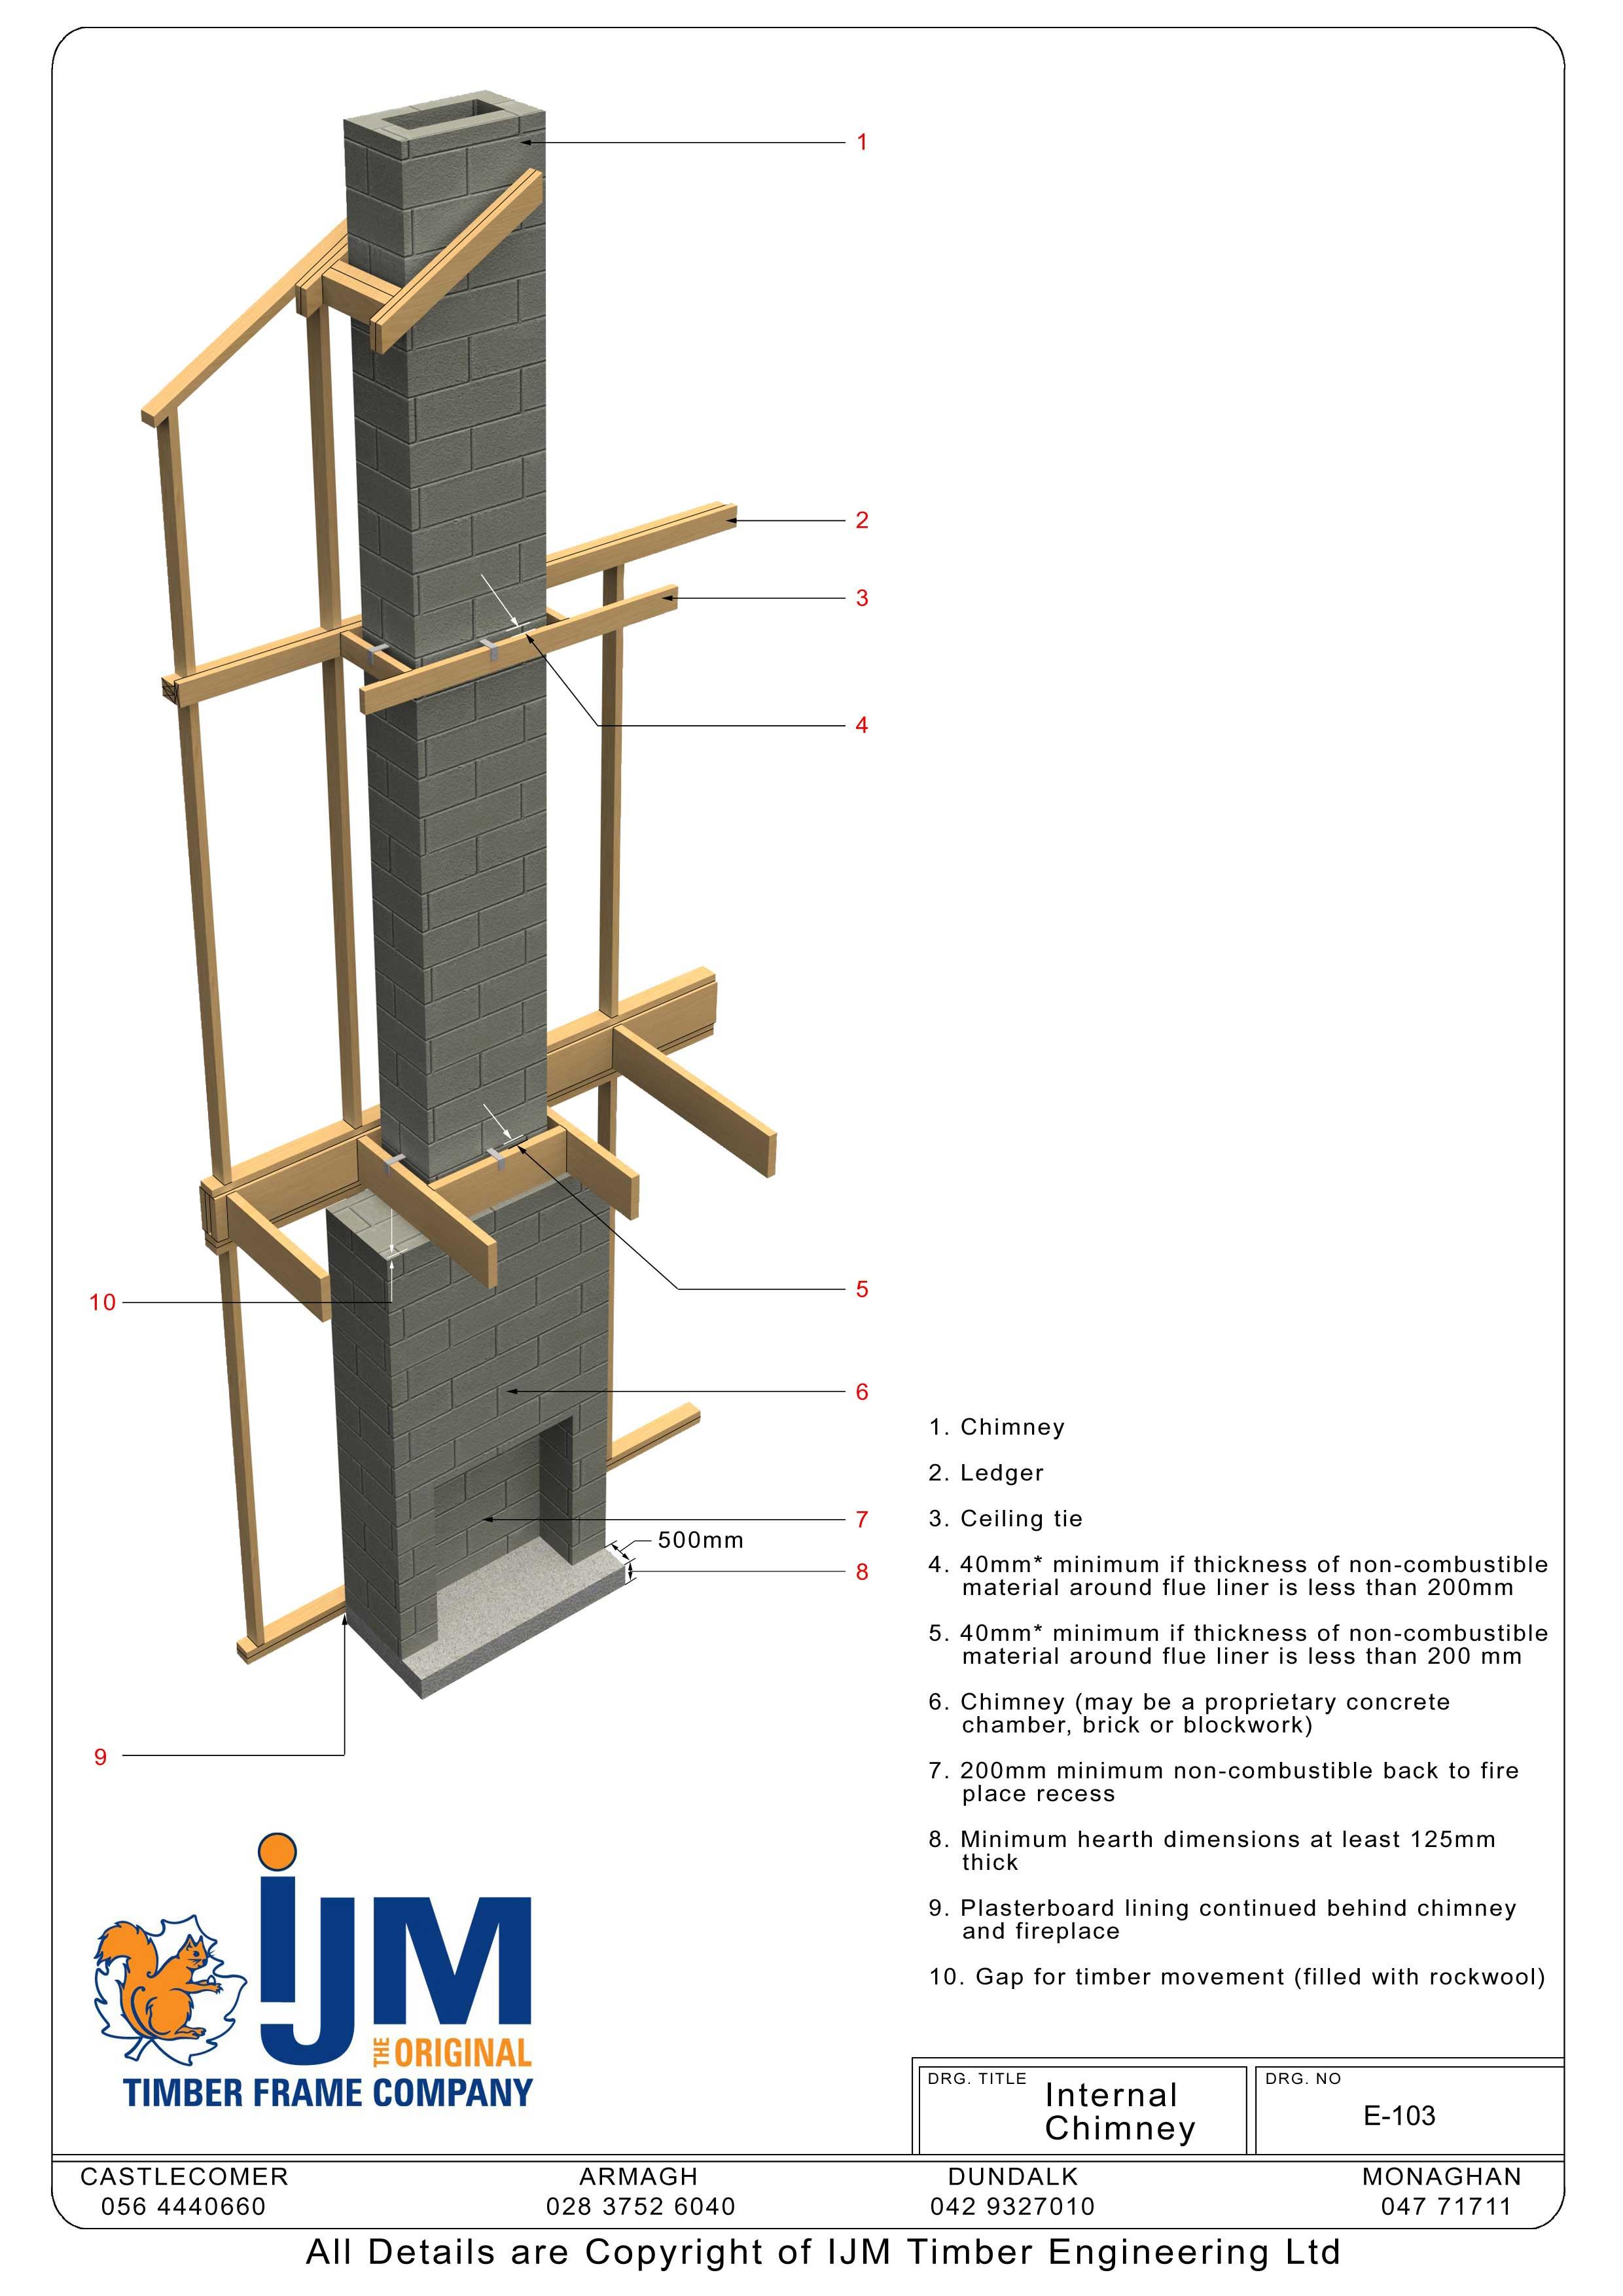 IJM Timberframe - Technical Details - Book of Details - Chapter 4